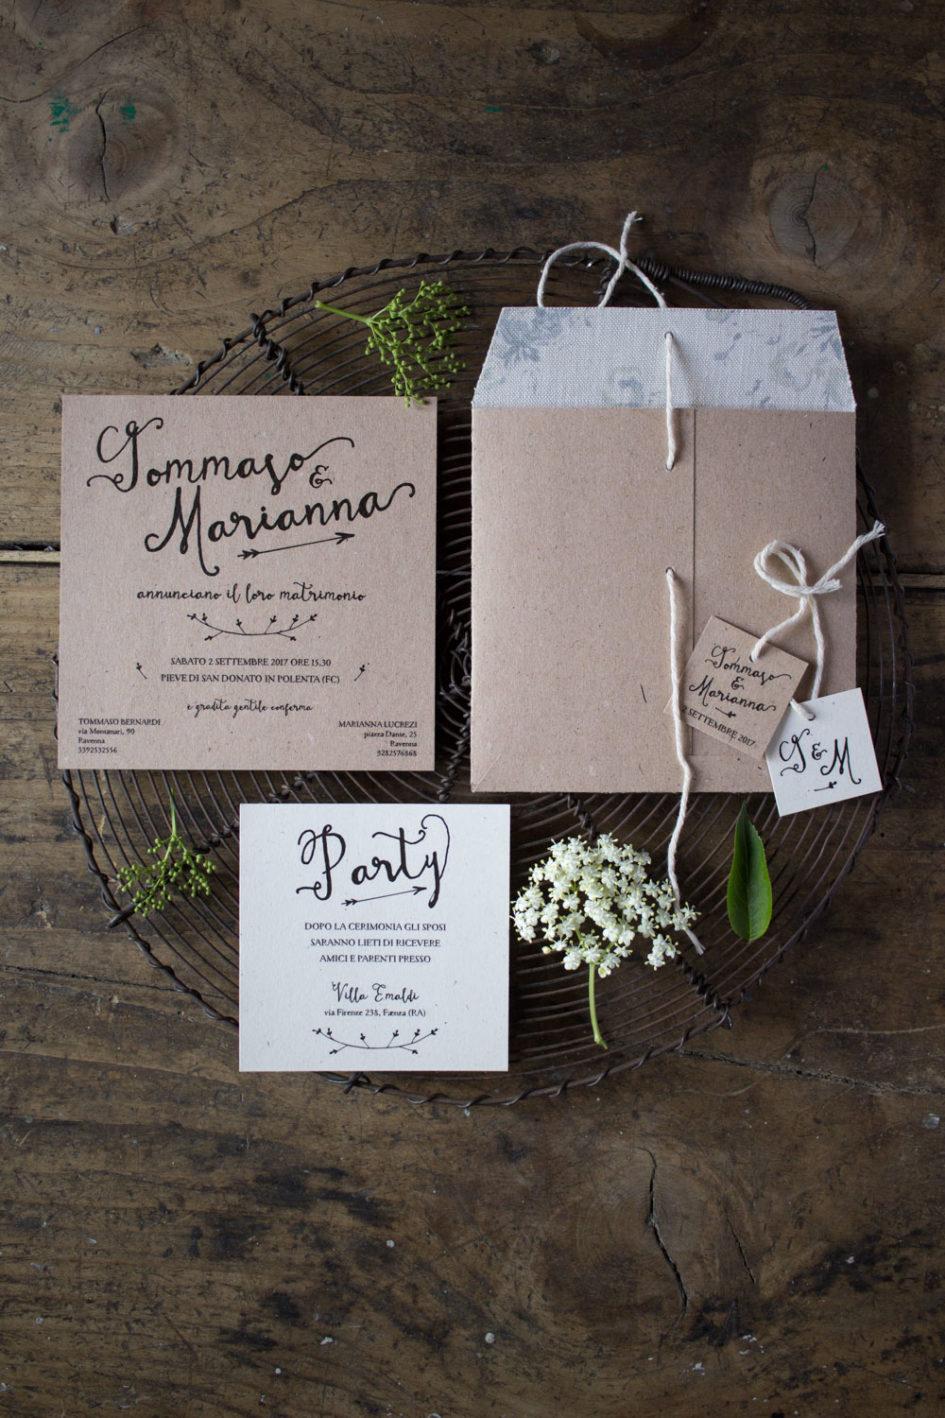 Eccezionale Wedding suite rustica - Campagna Inglese | Lily&Sage Design KI18